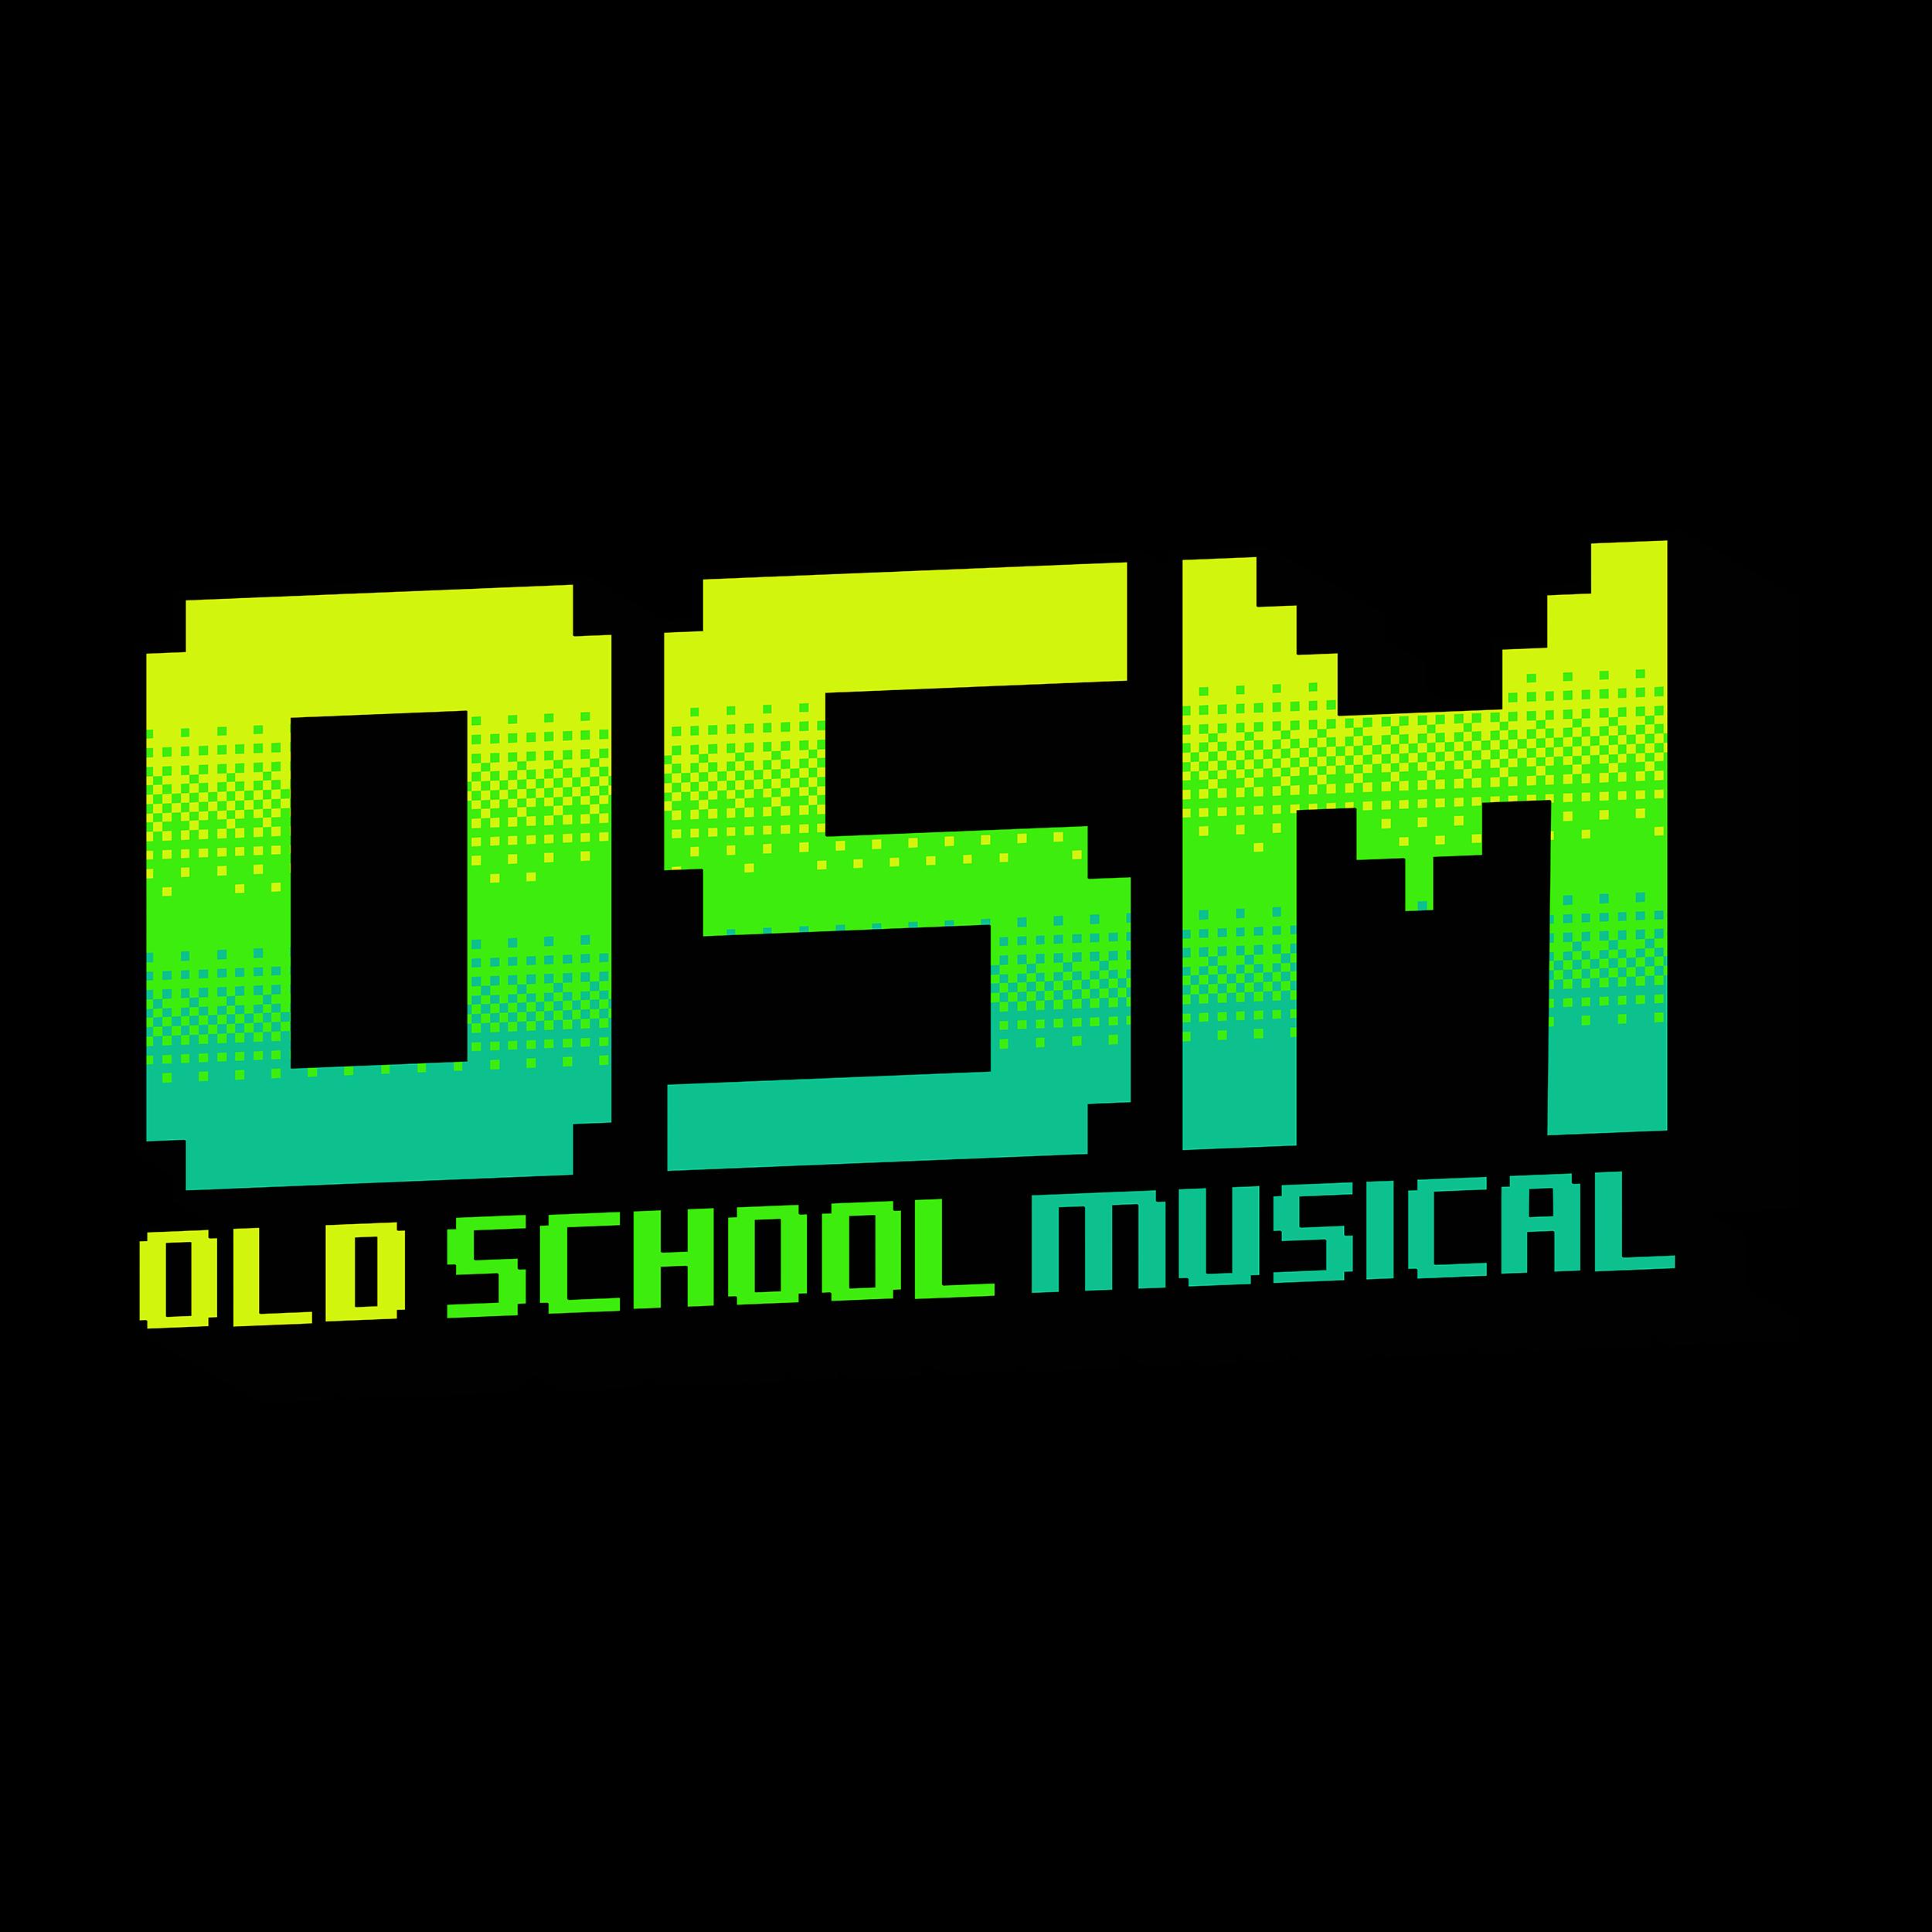 Old School Musical logo